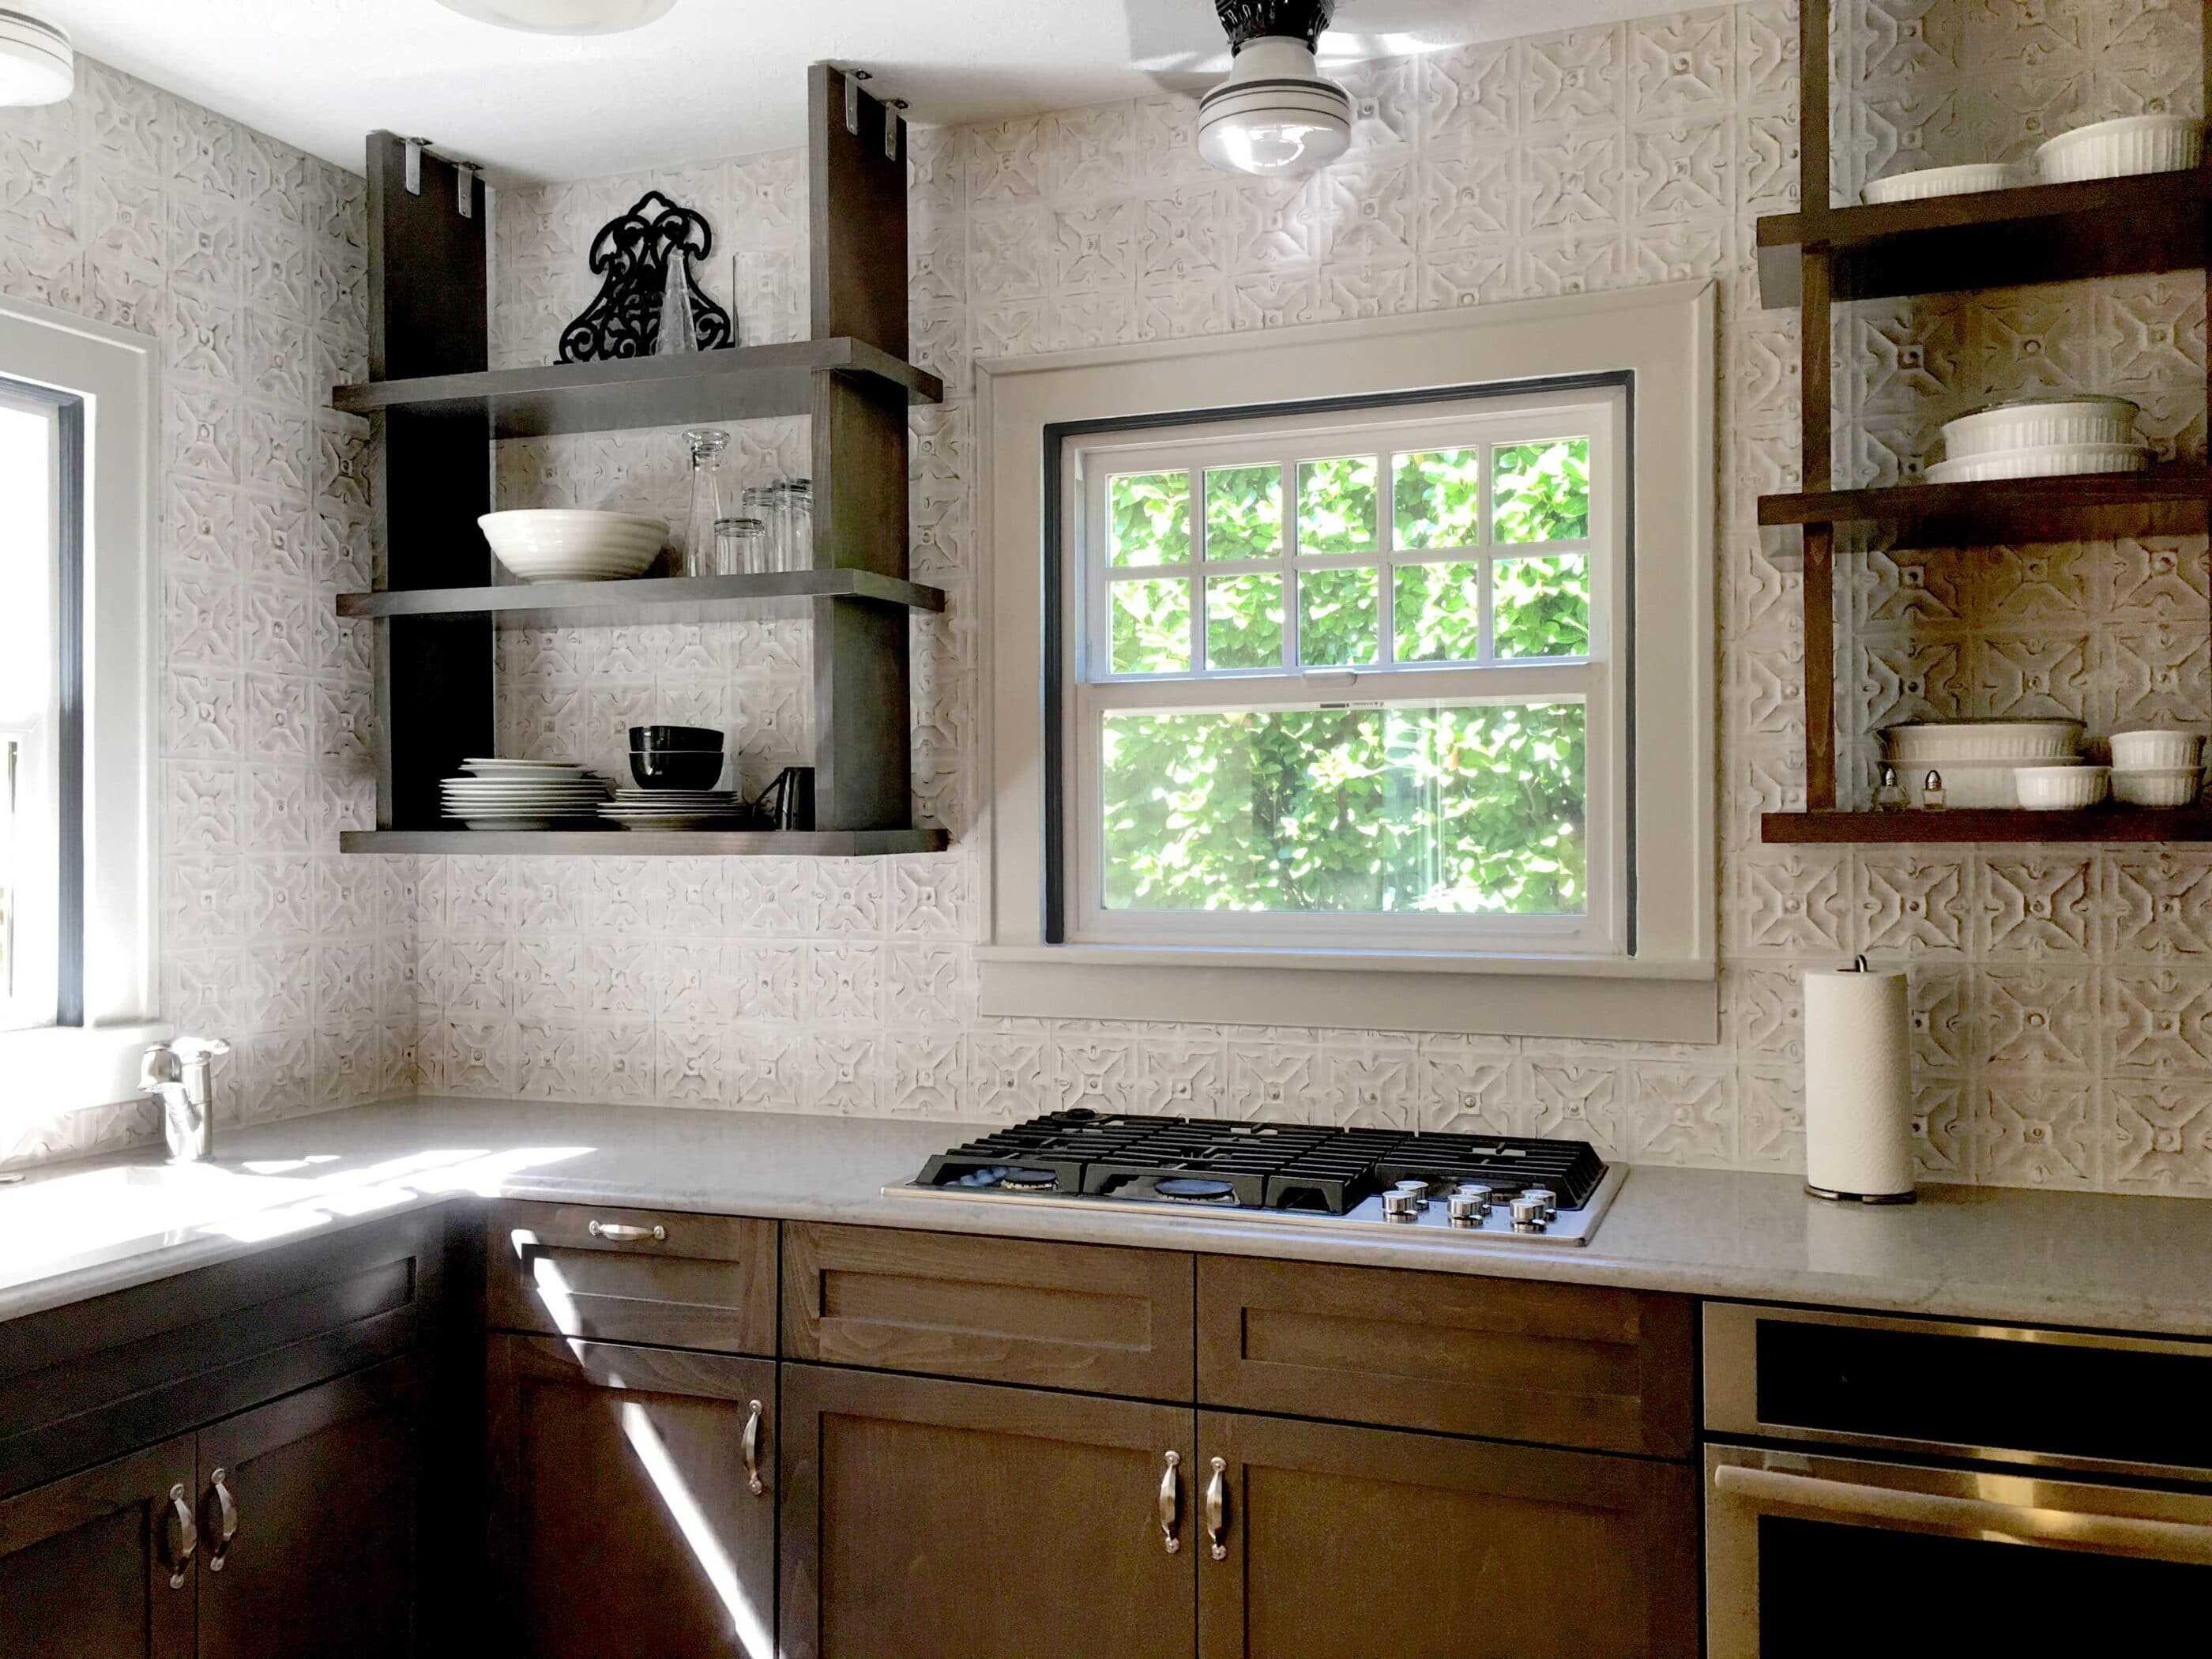 beautiful kitchen remodel with gray tile backsplash